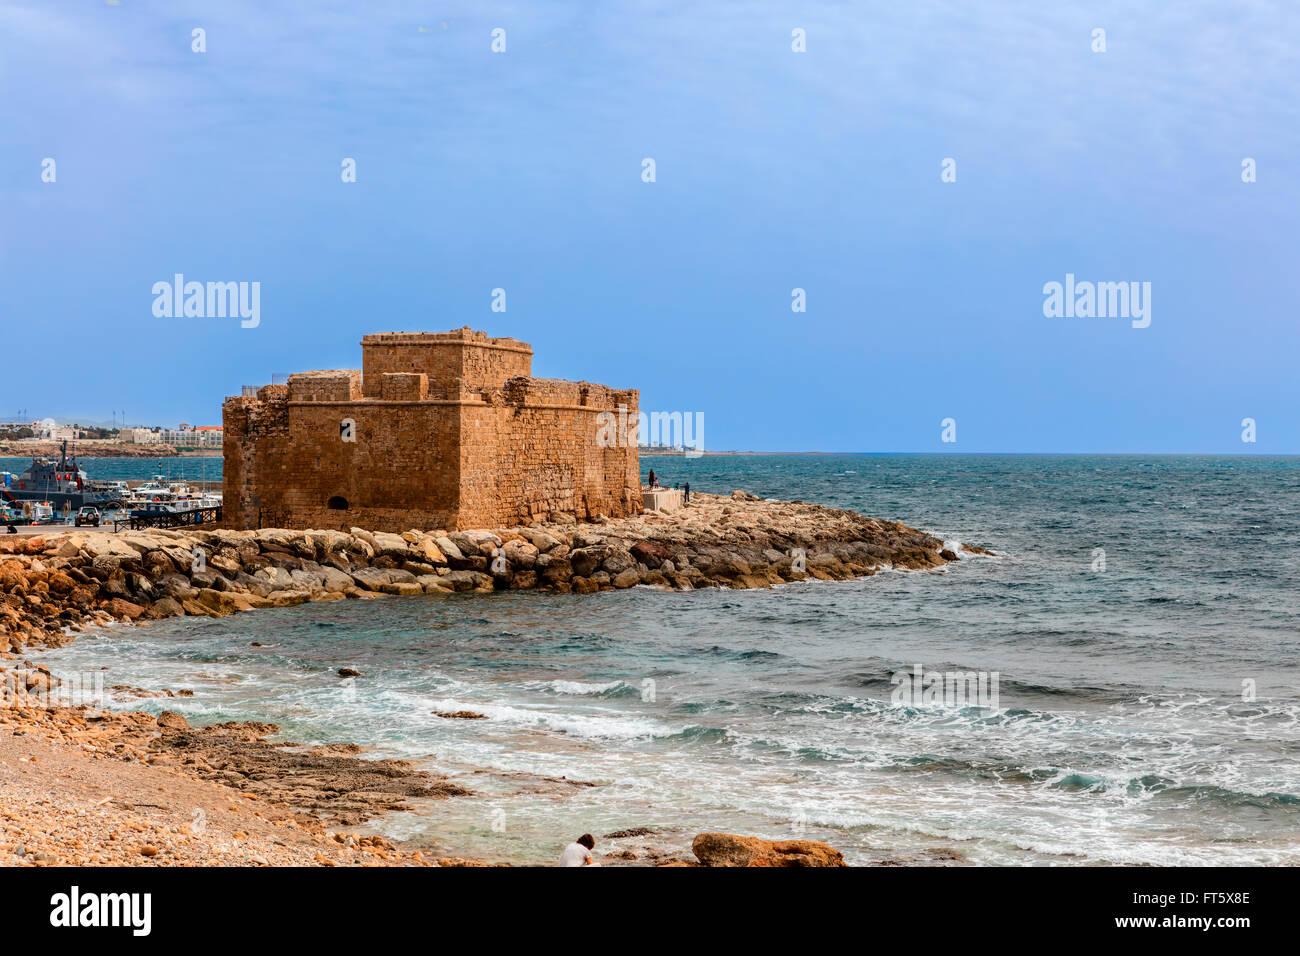 Castello medievale in Paphos, Cipro. Immagini Stock